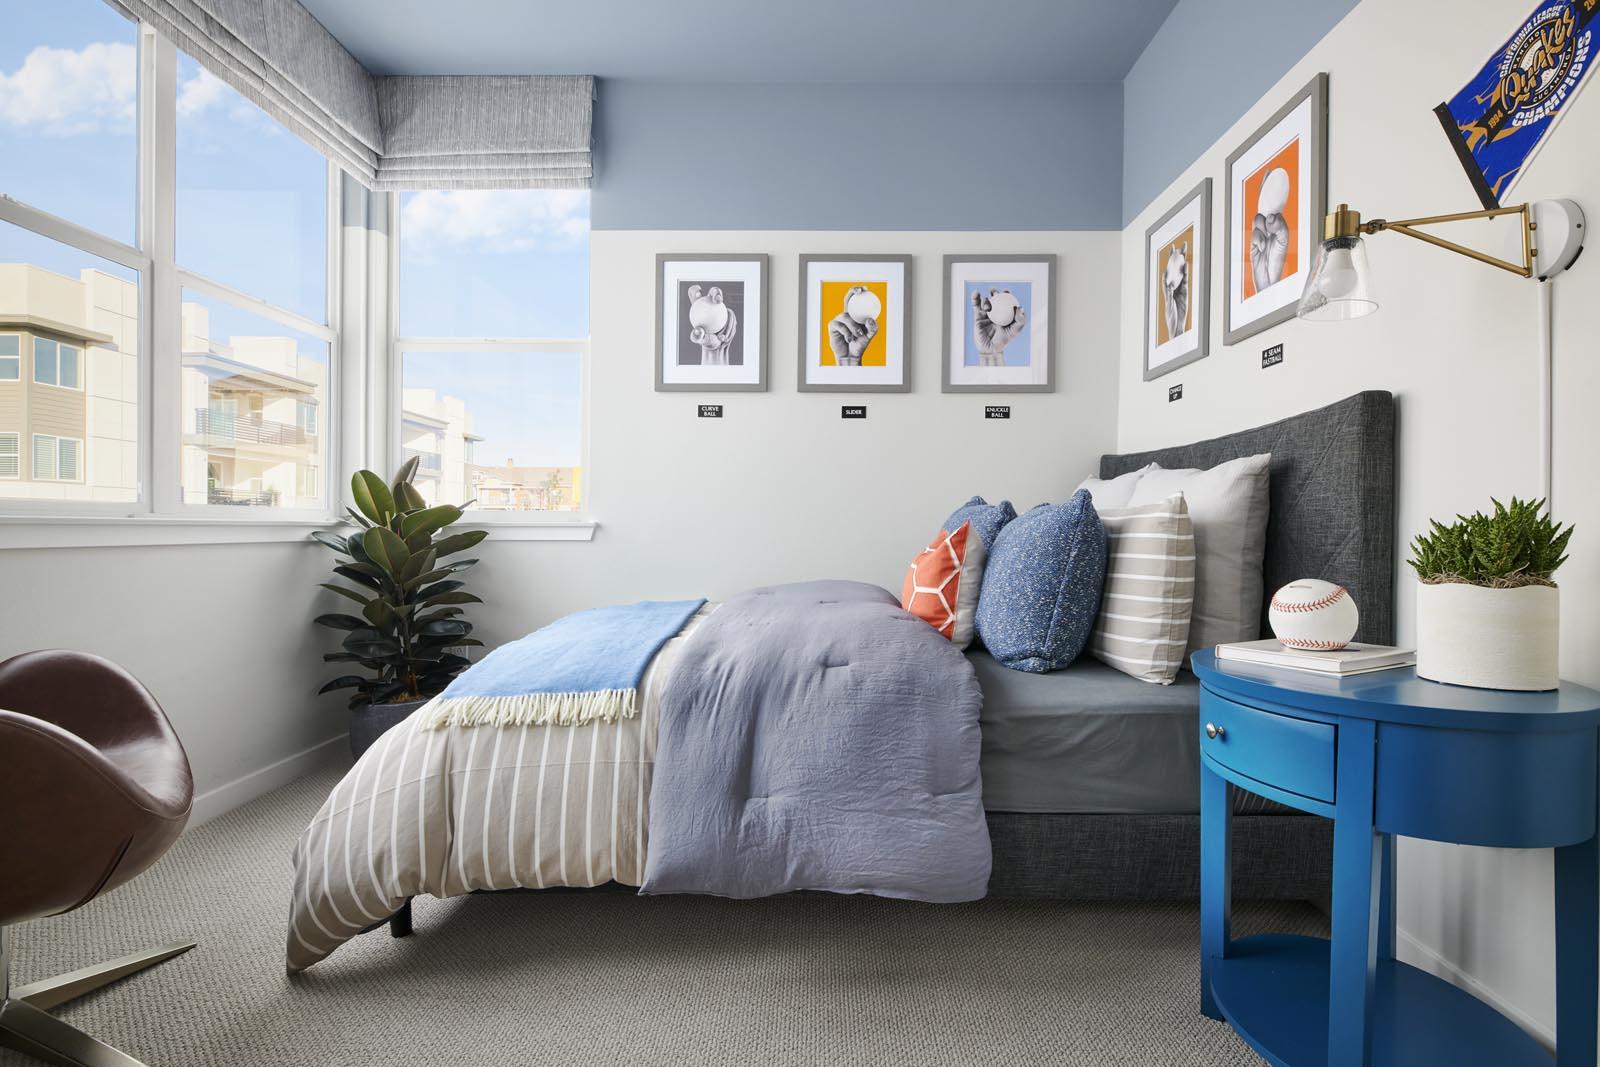 Bedroom | Residence 1 | Enliven | New Homes in Rancho Cucamonga, CA | Van Daele Homes